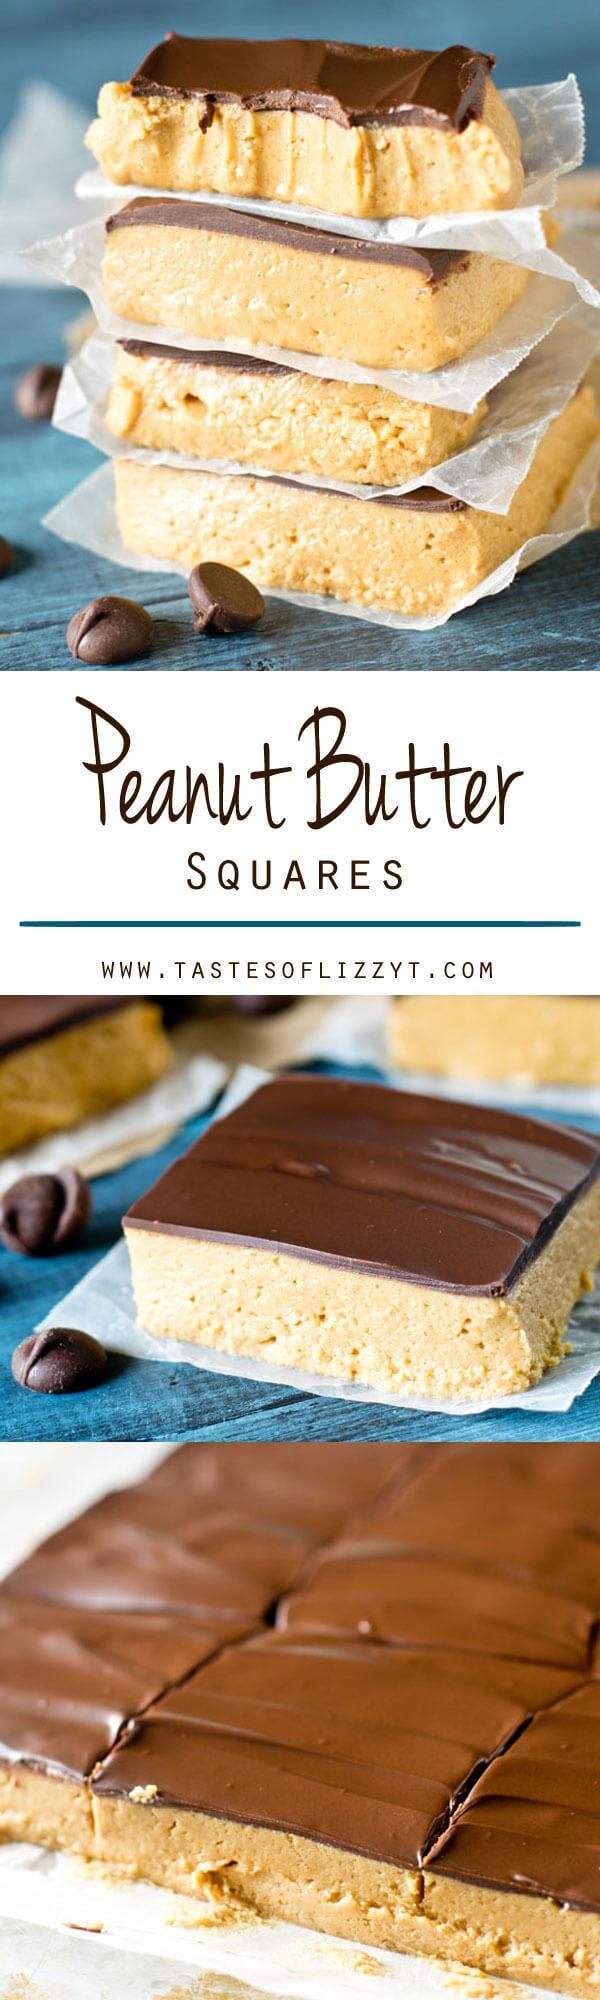 peanut butter squares recipe / homemade reese's cups / easy dessert recipe / no bake dessert / chocolate / peanut butter / school lunch via @tastesoflizzyt